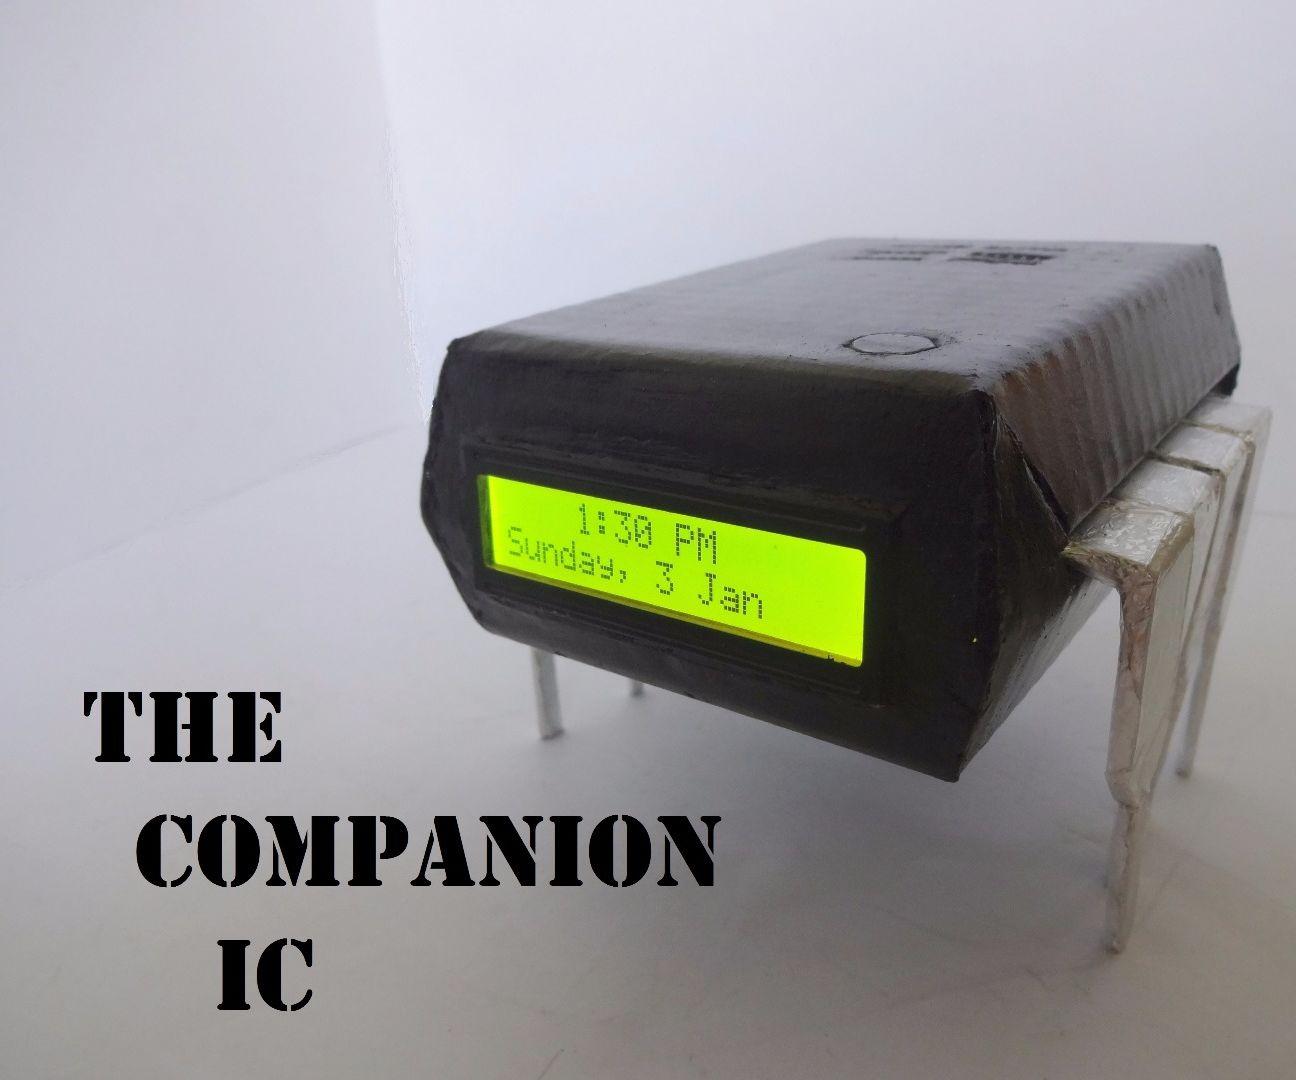 The Companion IC